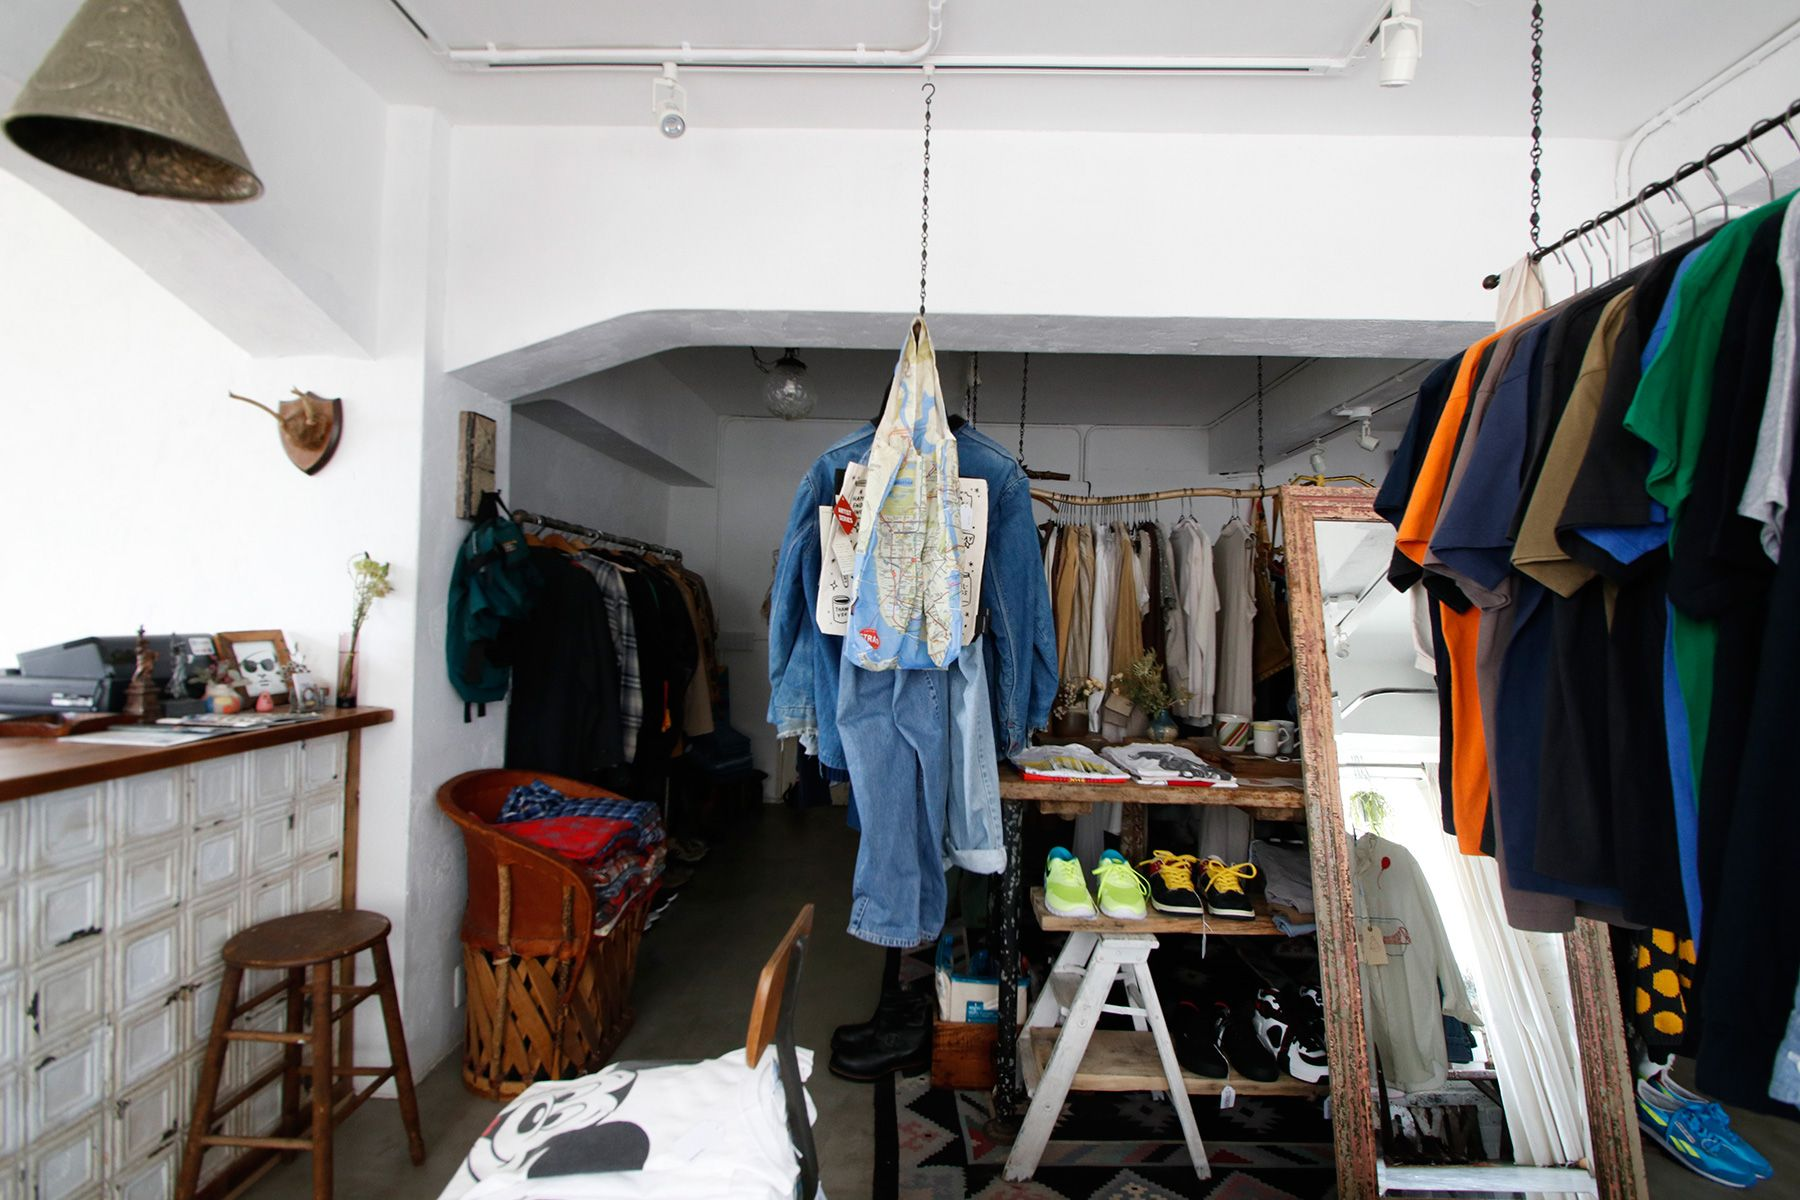 STRANGER/shop (ストレンジャー)店内 玄関に向かって